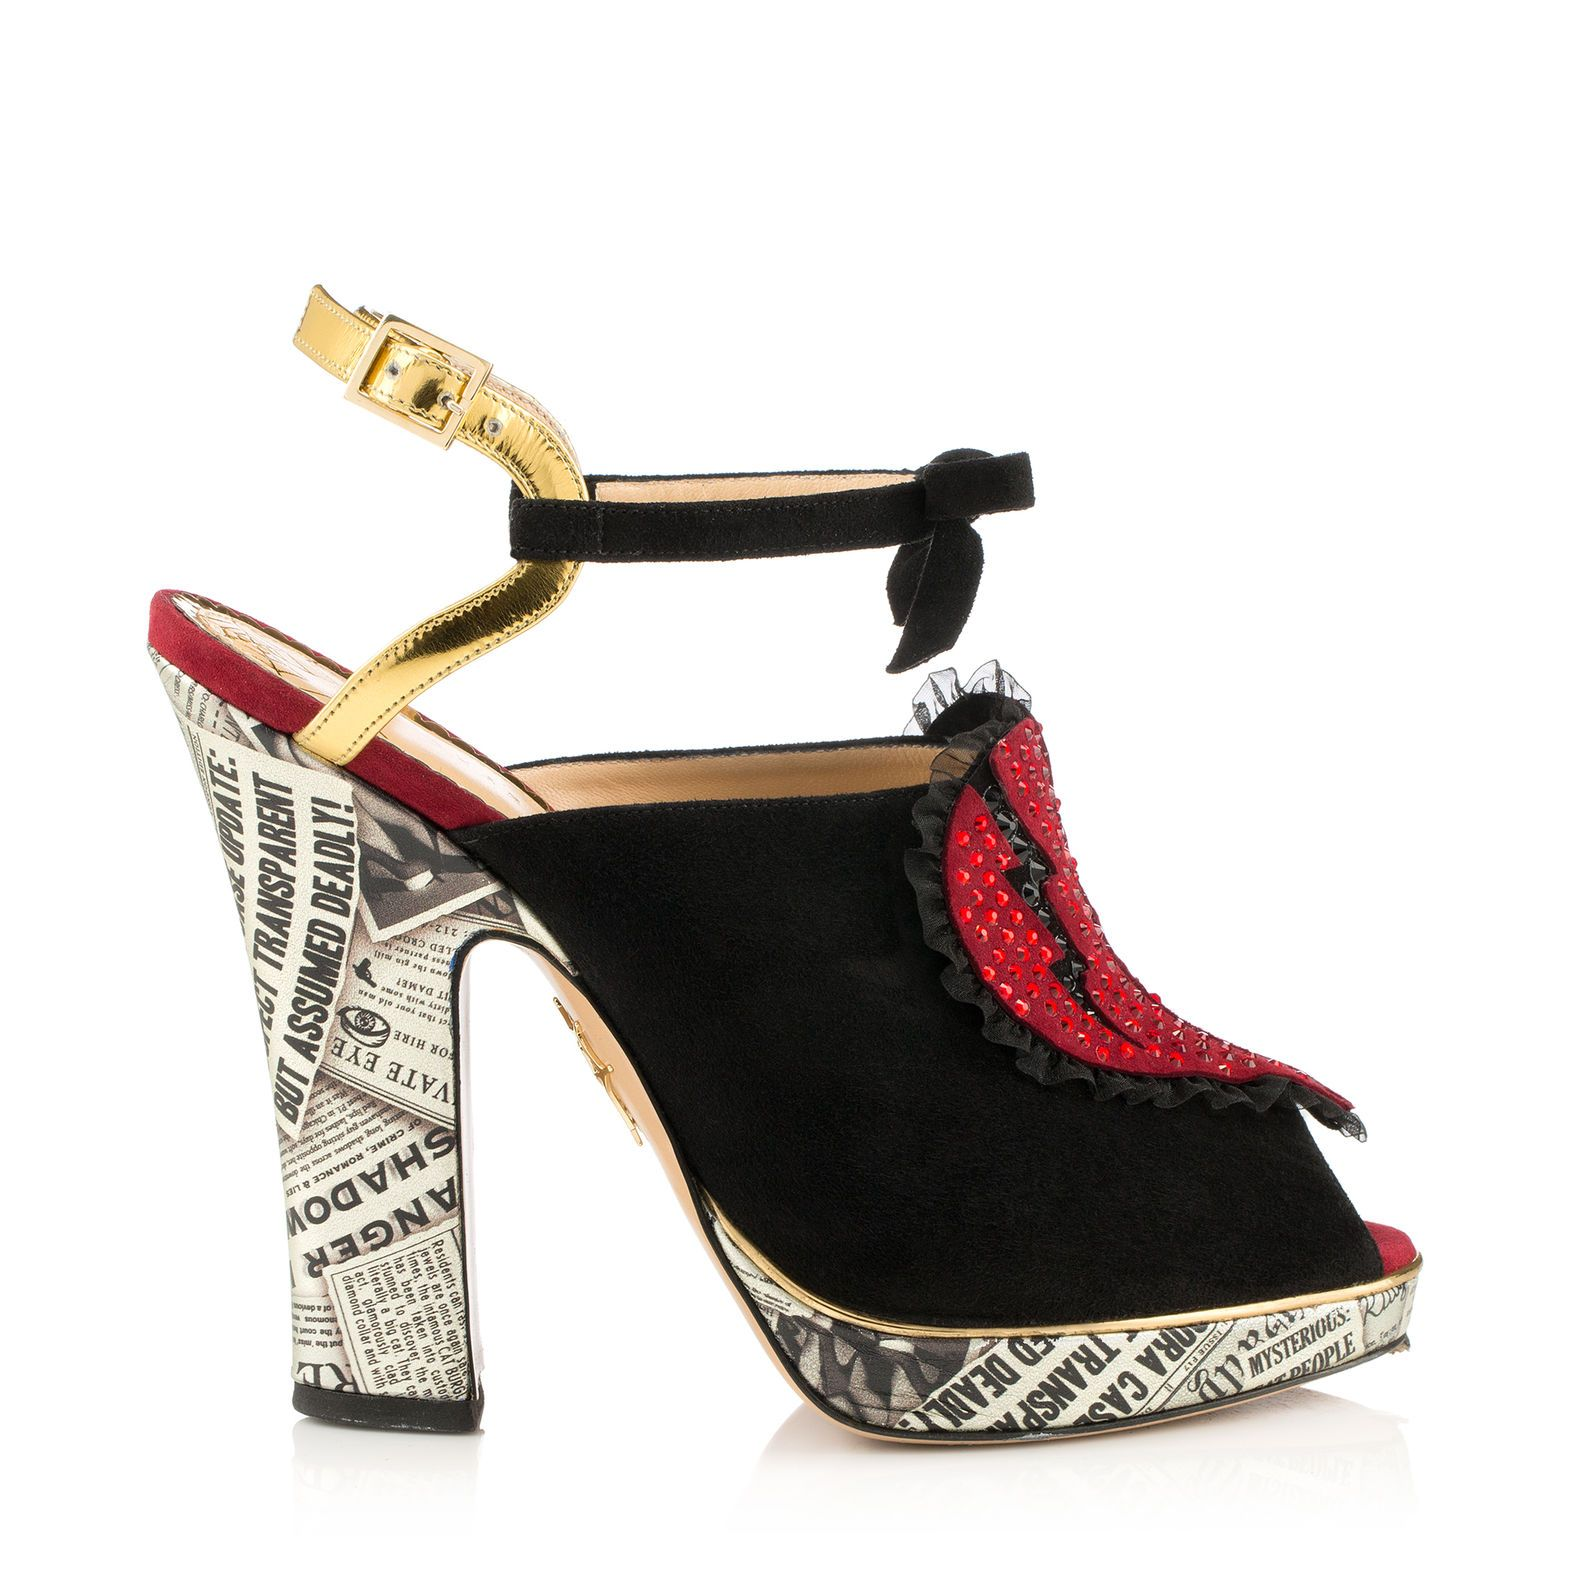 37b9db1e63 Break hearts this season in the Charlotte Olympia Killer Heels. This new  platform sandal in